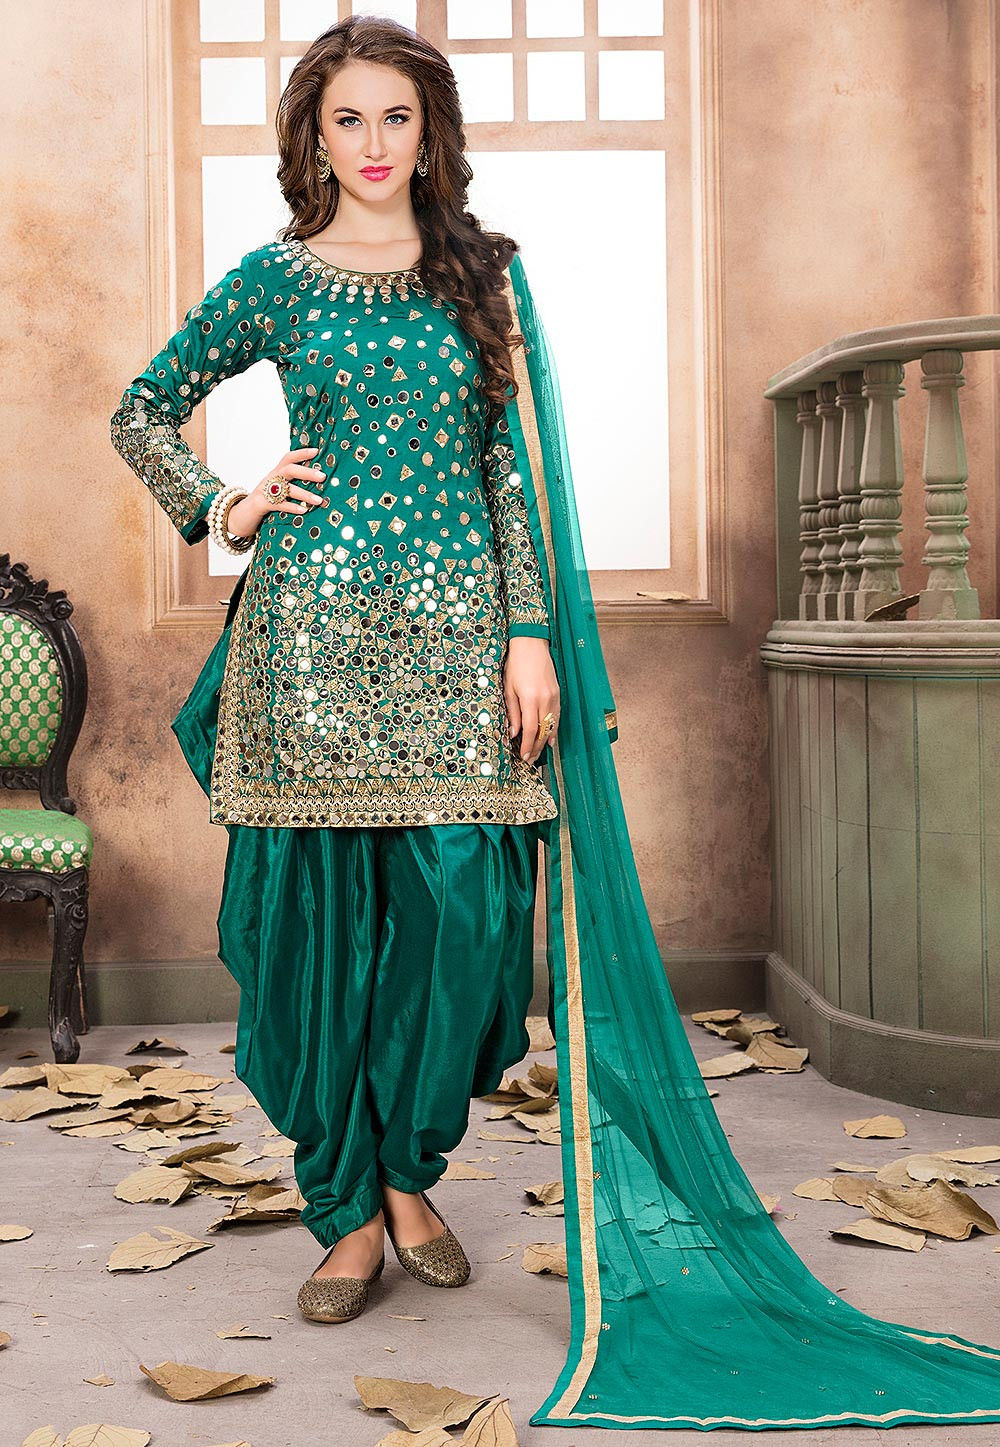 f7d75dc75b18a Embroidered Taffeta Silk Punjabi Suit in Teal Green : KCH973